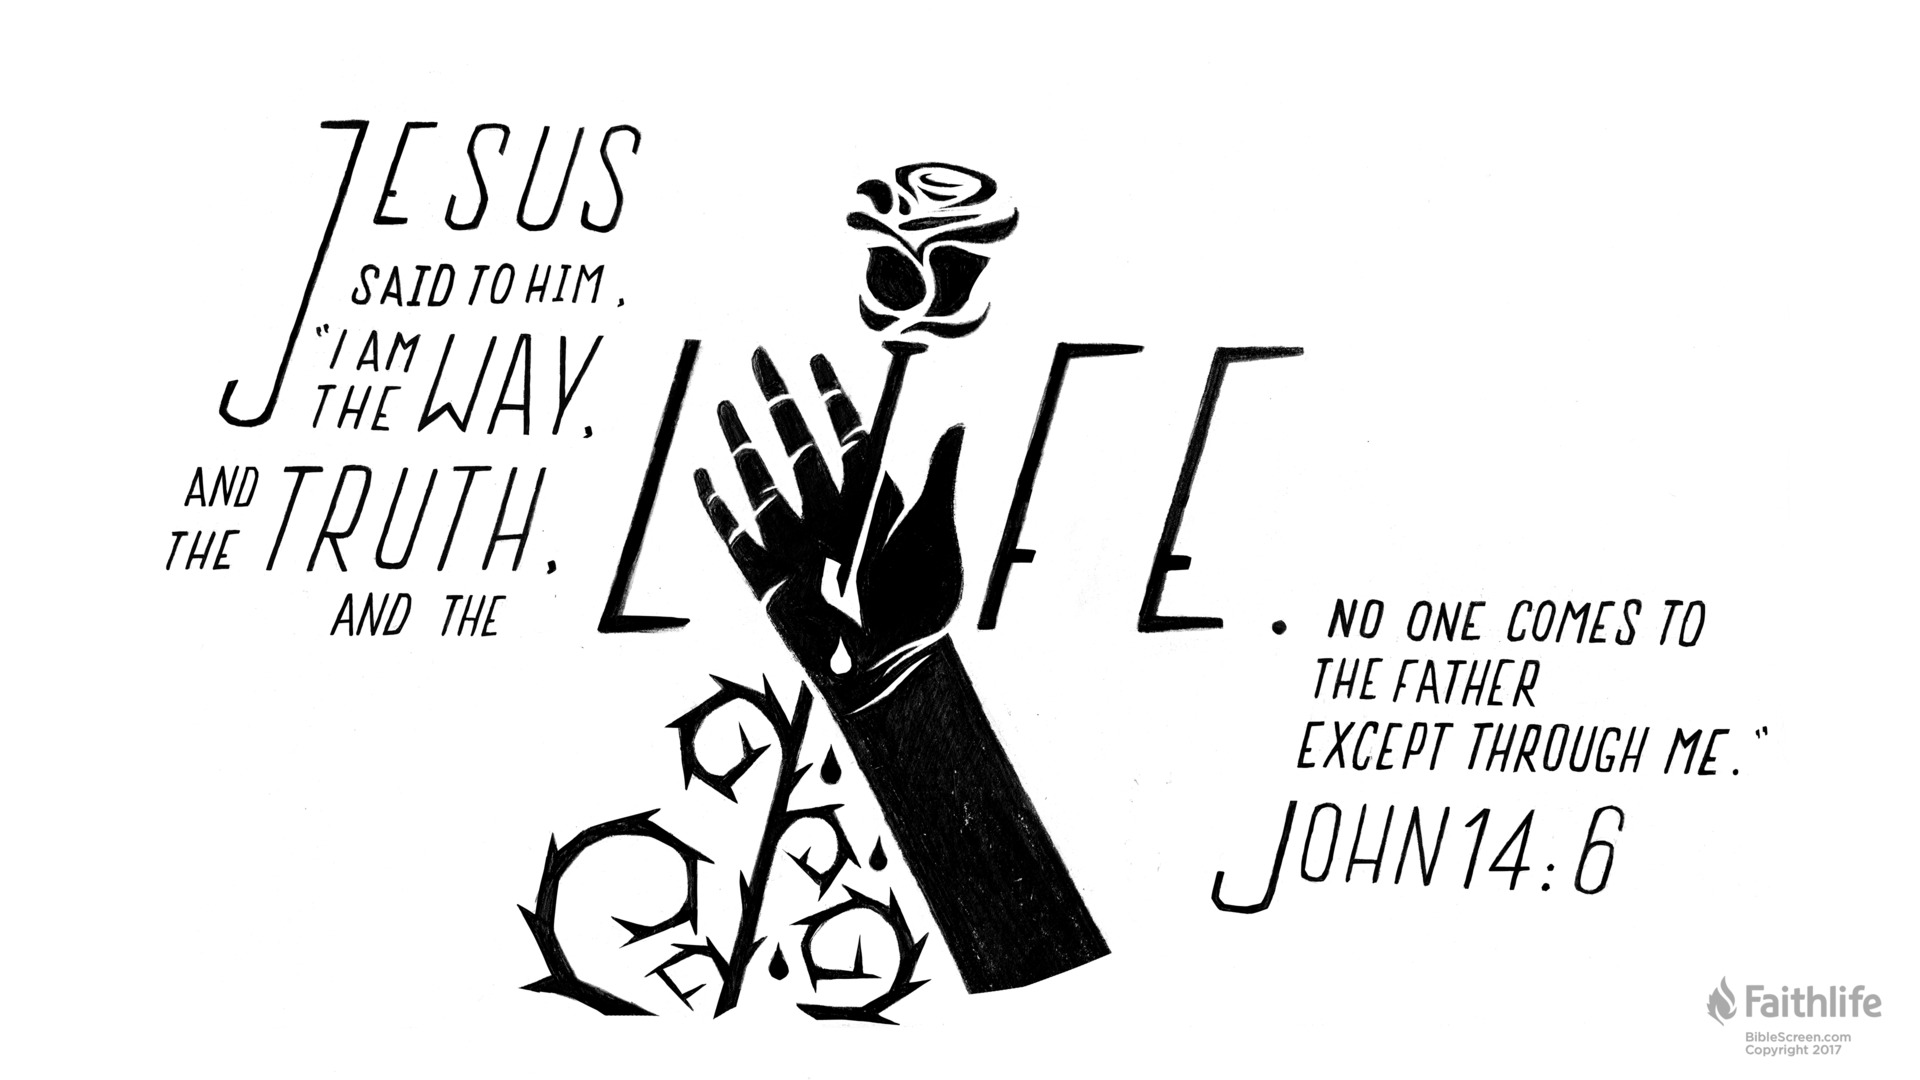 John 14:6 Graphic